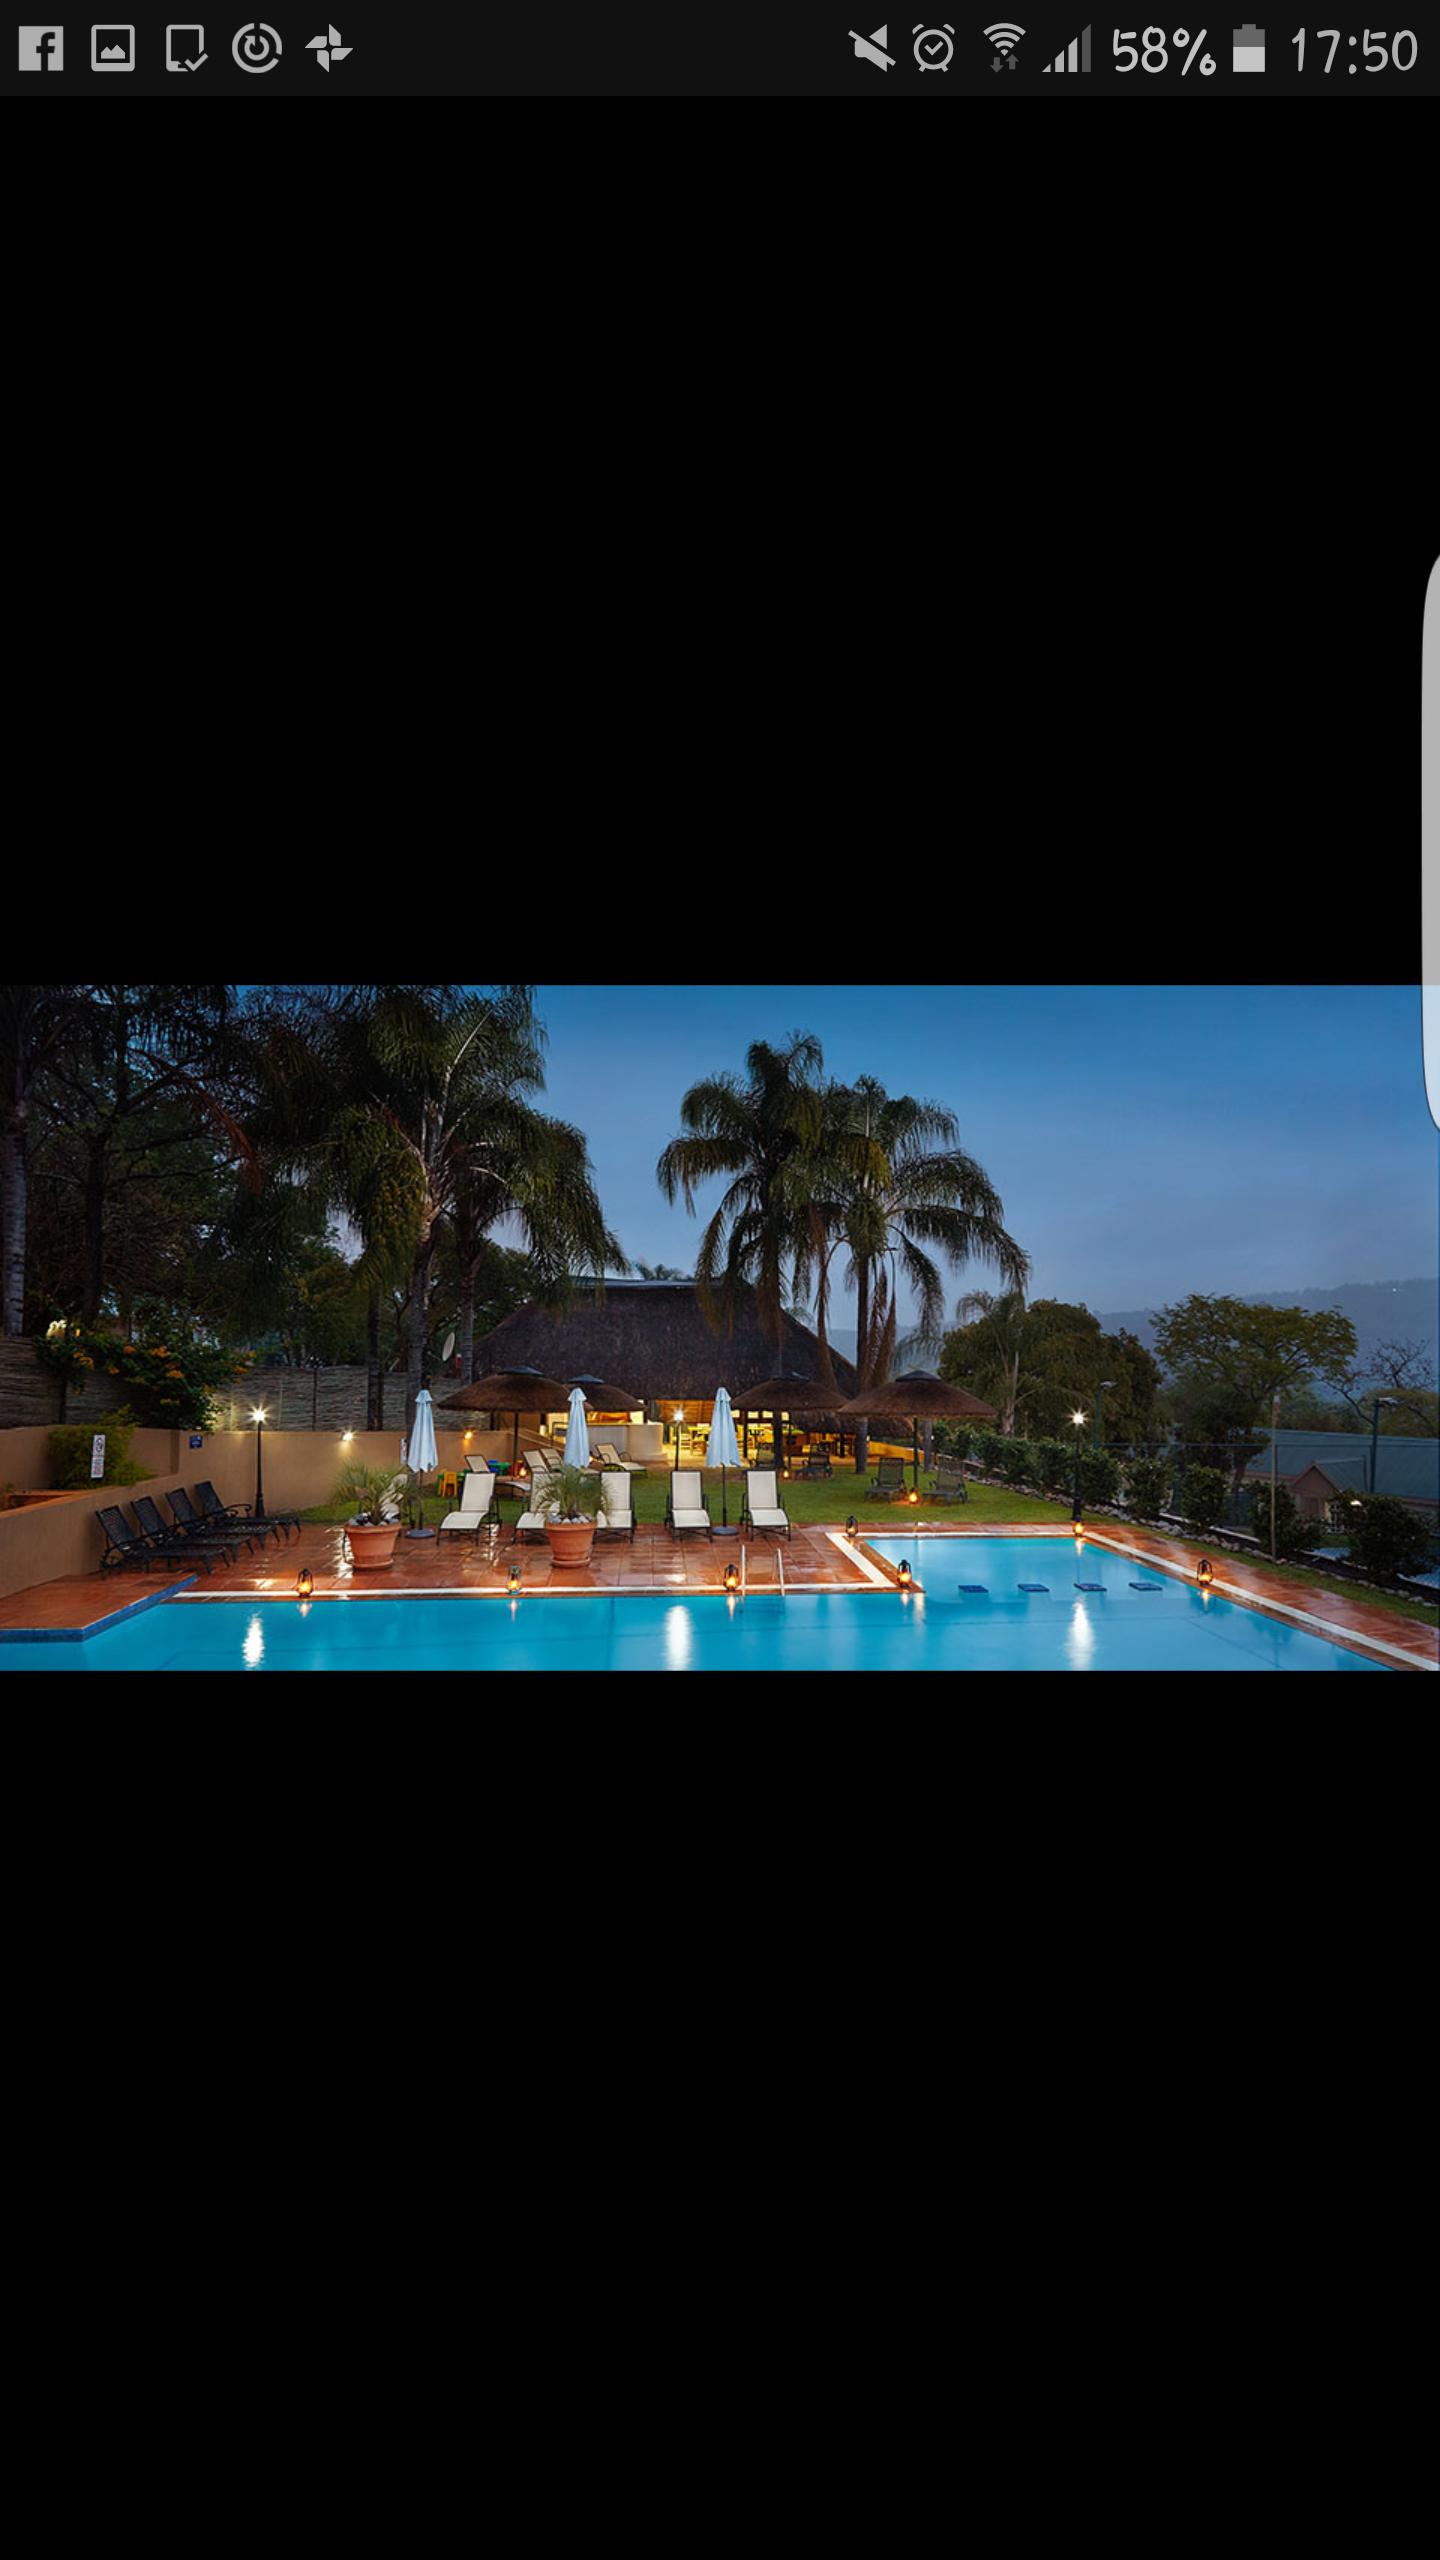 7 nights accommodation